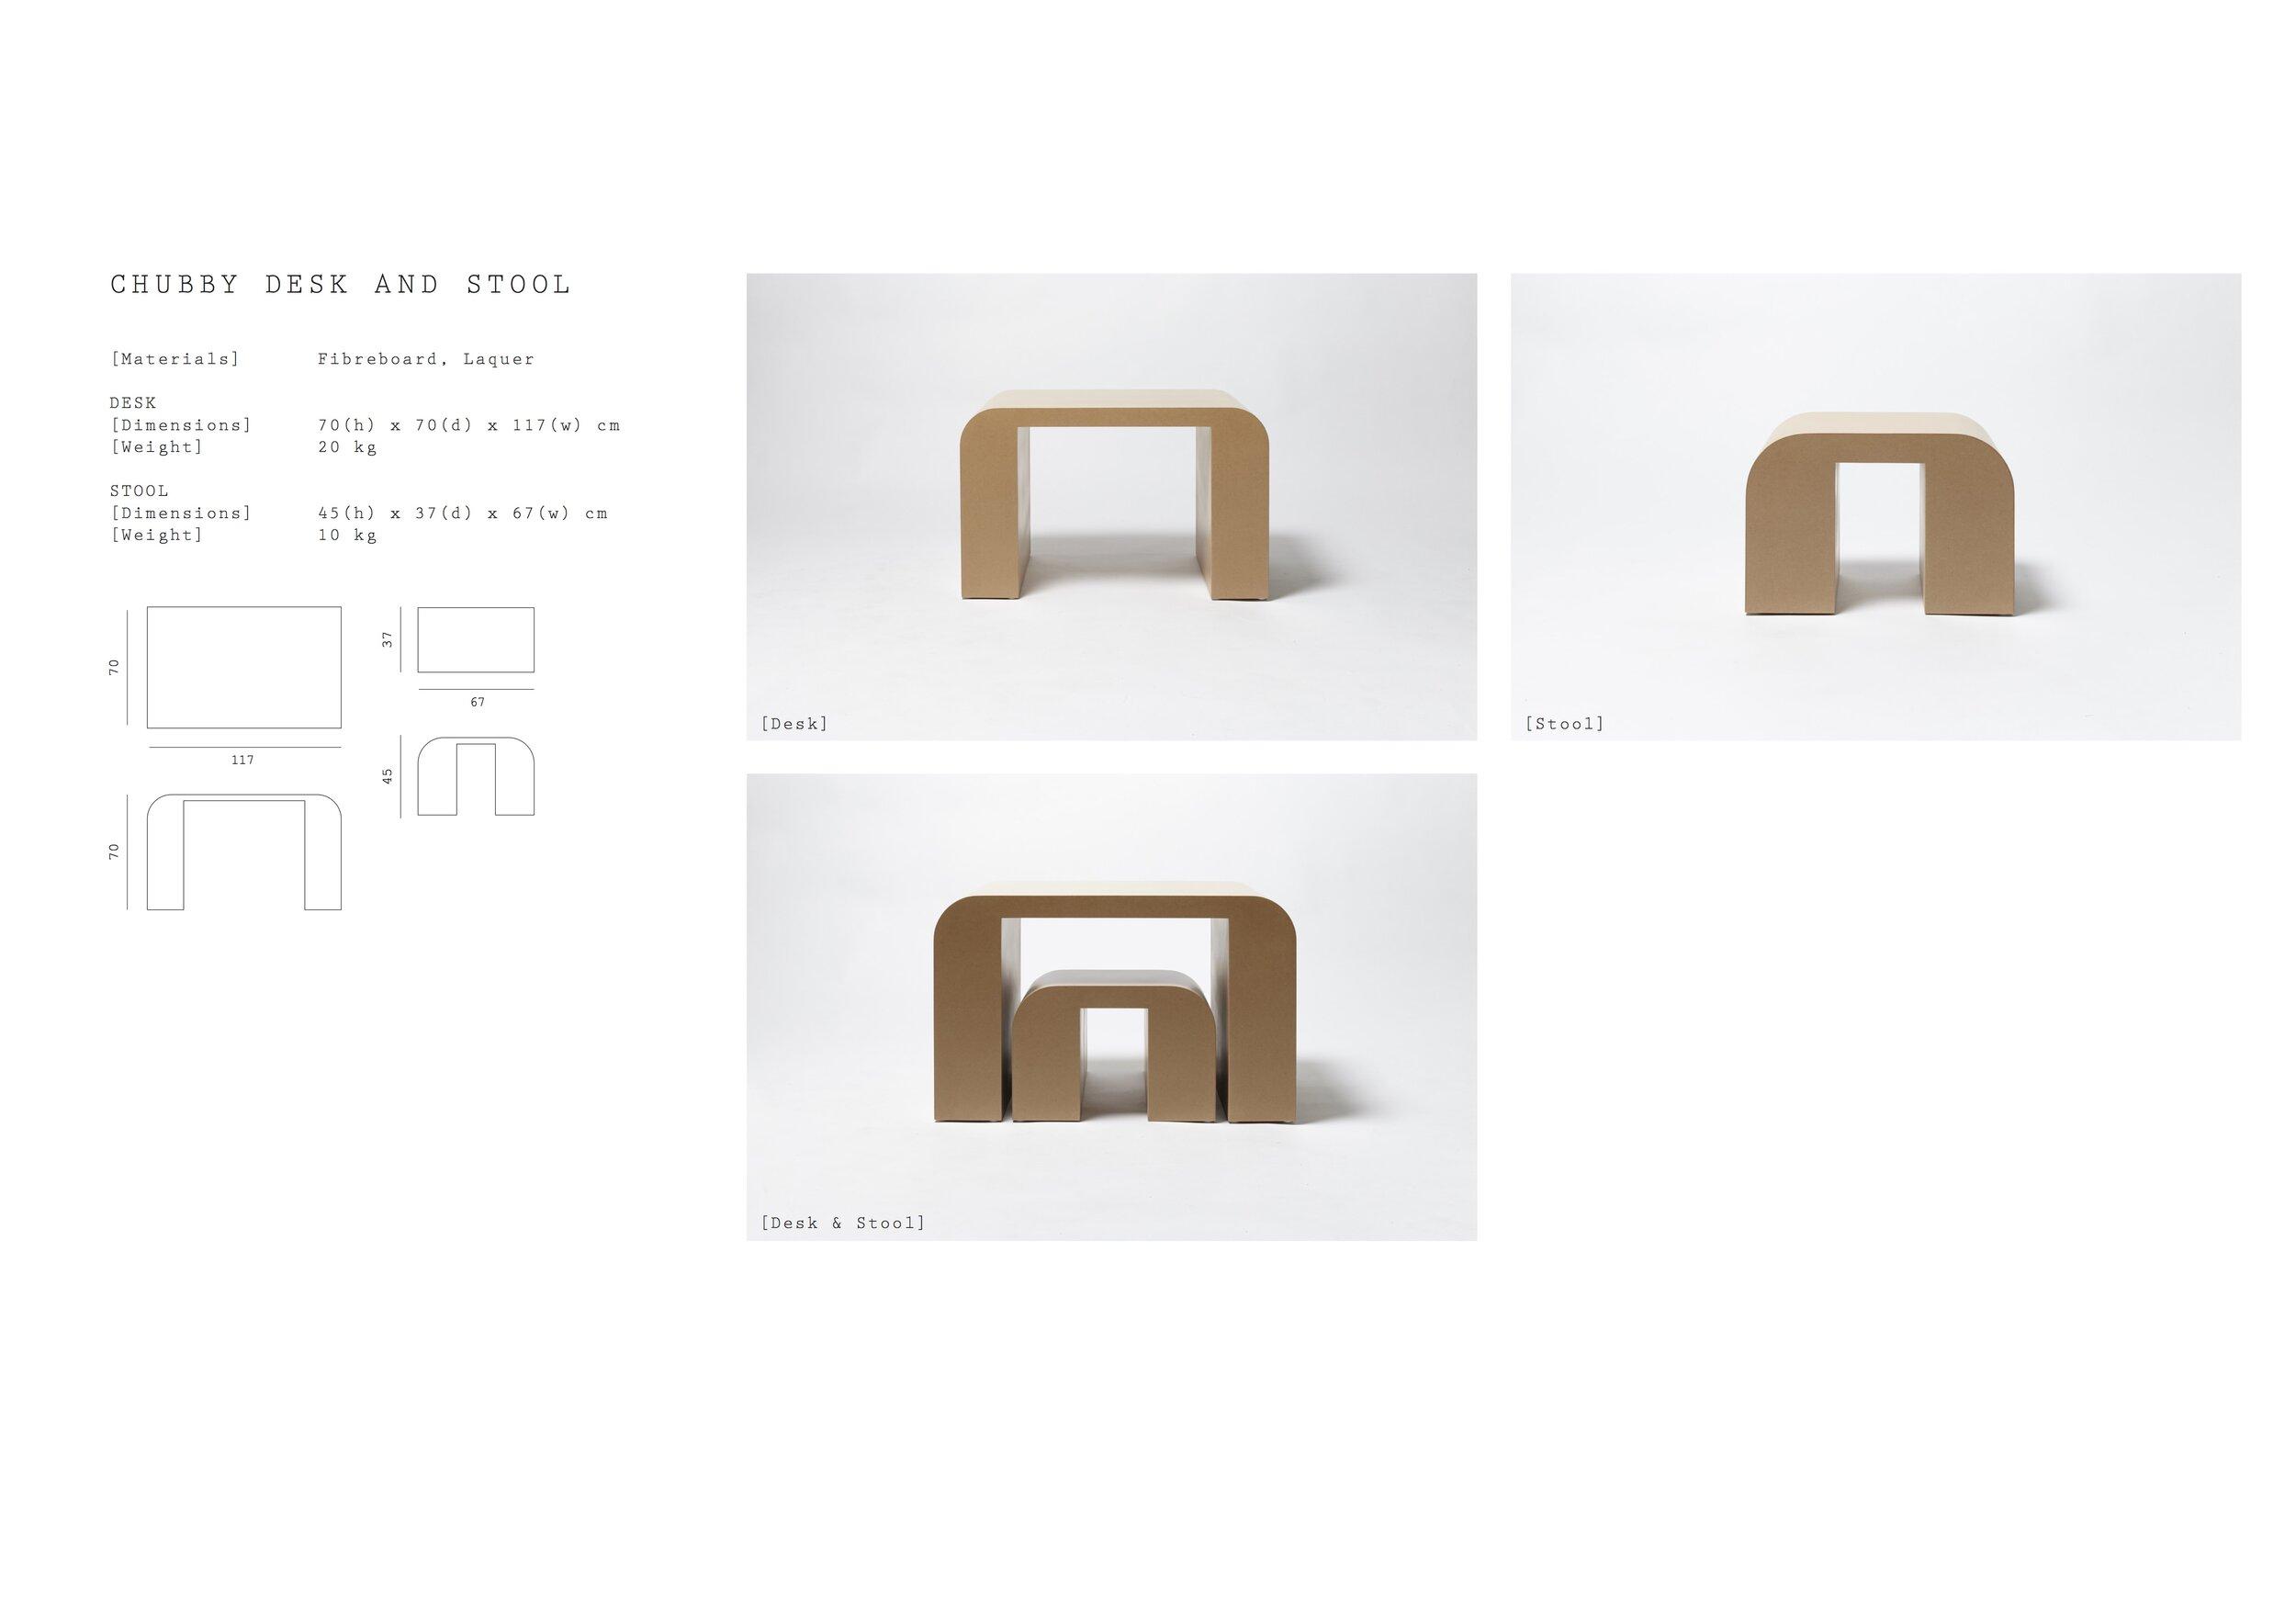 Catalogue_Unlimited_190912_CHUBBY_DESK_STOOL copy.jpg